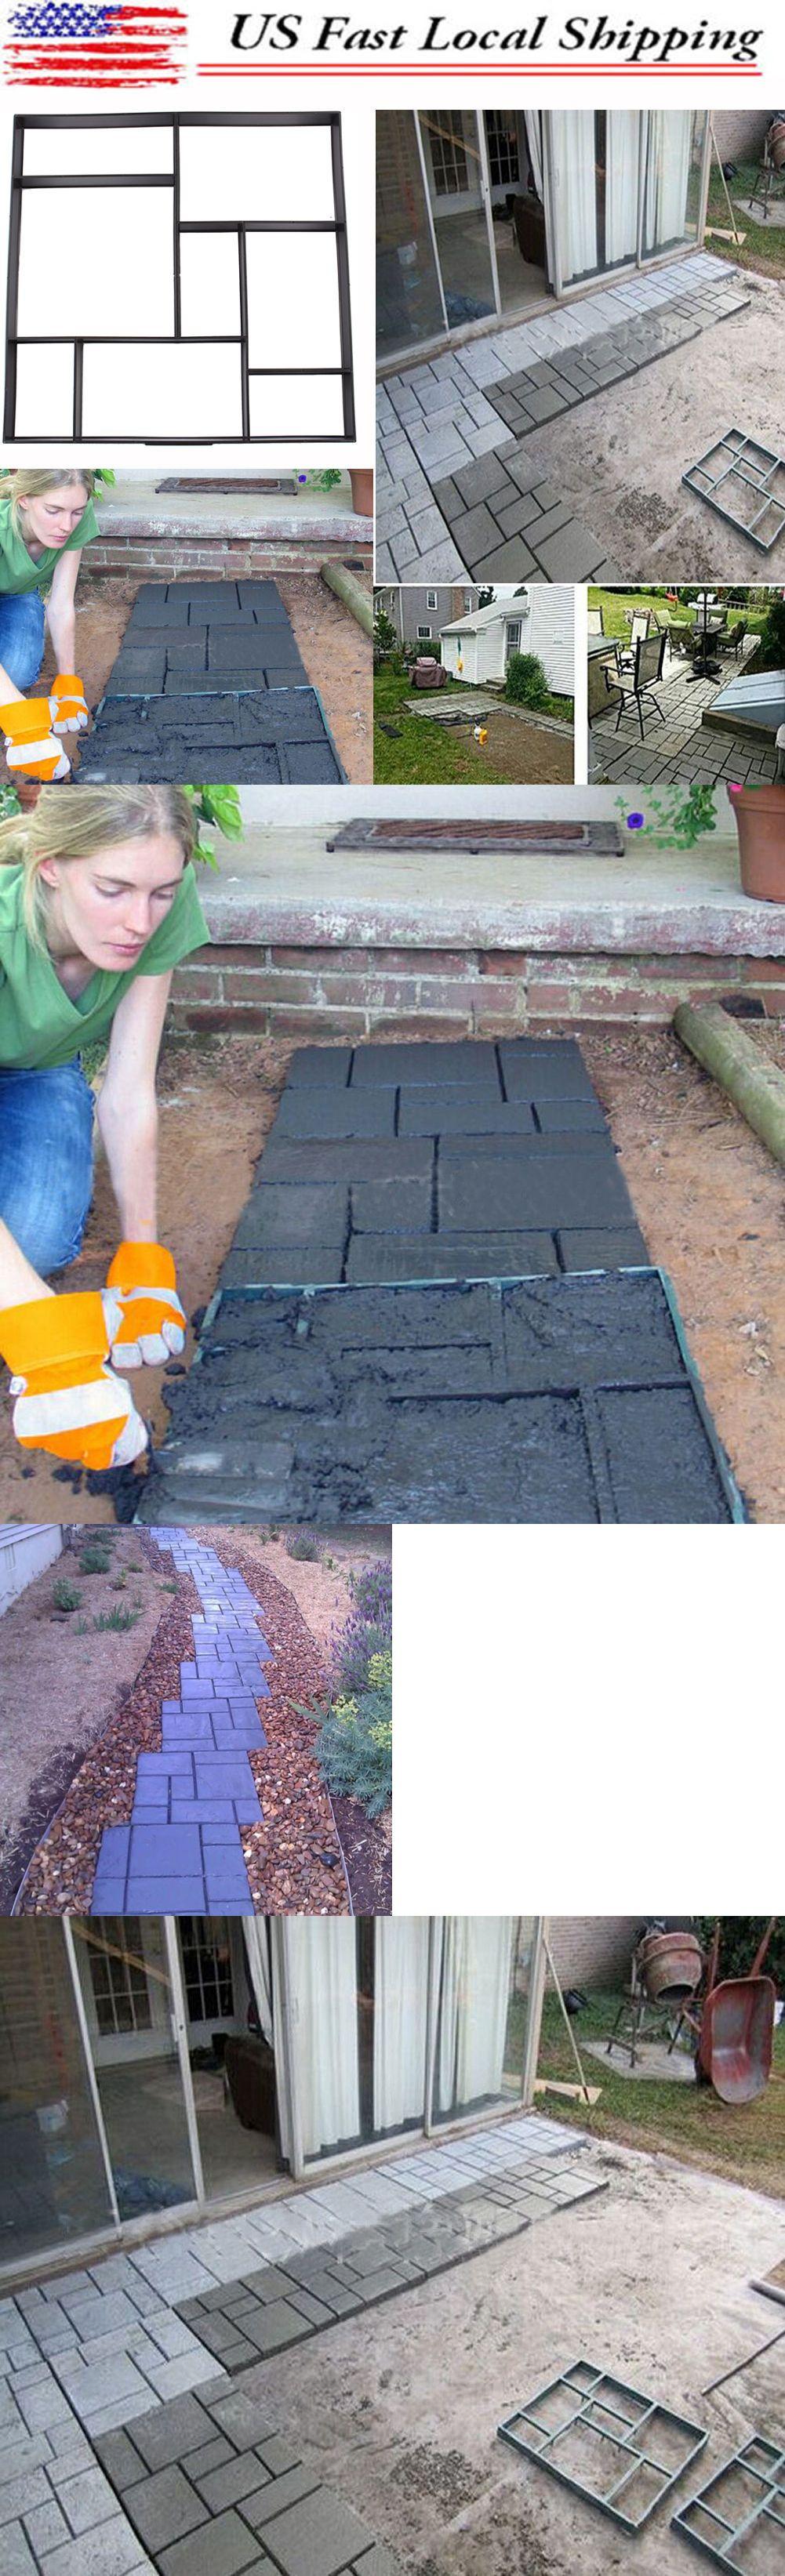 Diy driveway paving mold walk maker concrete stepping